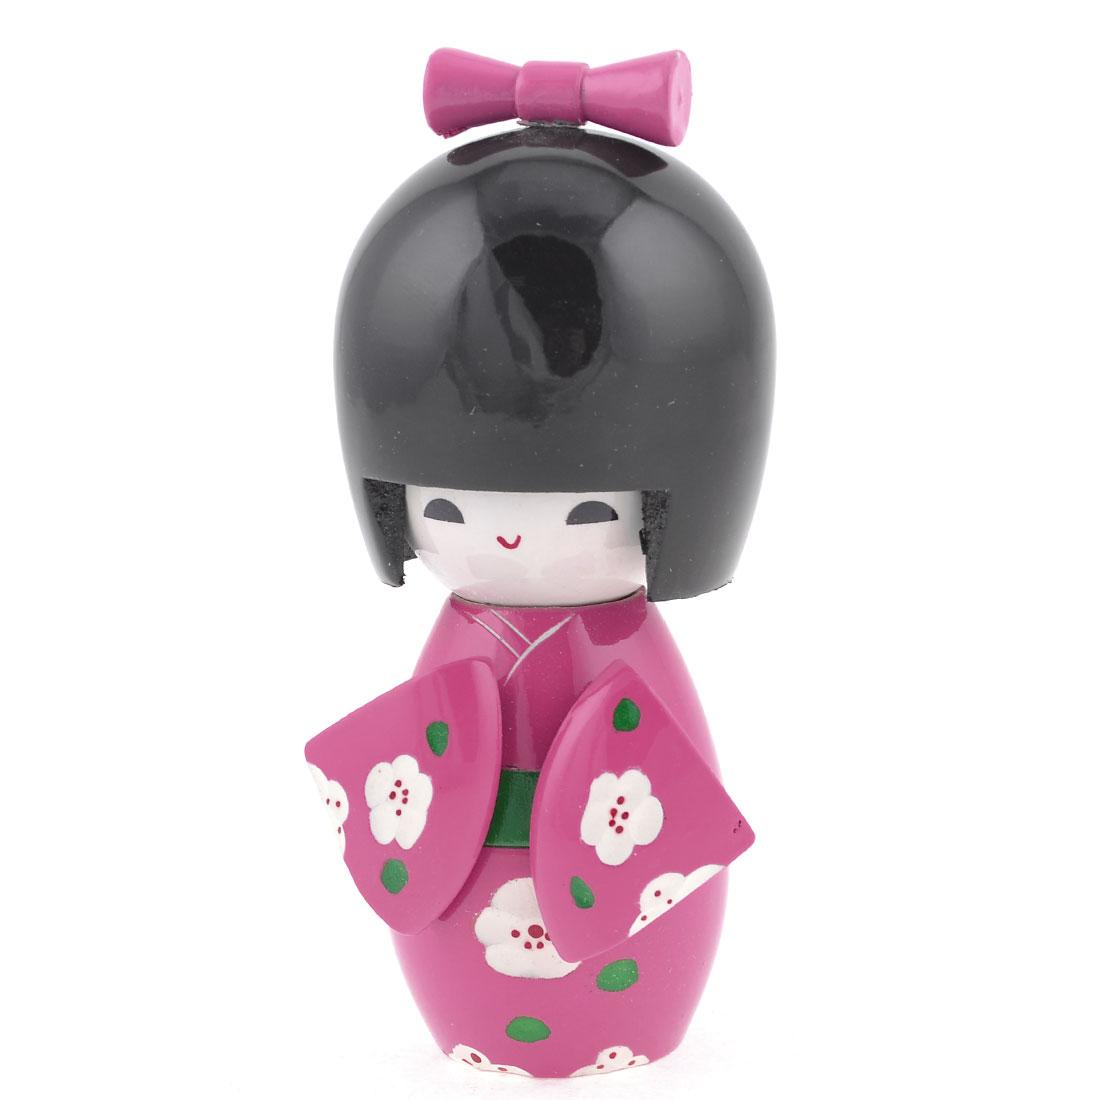 White Plum Blossom Print Wooden Japanese Kimono Kokeshi Doll Toy Pink